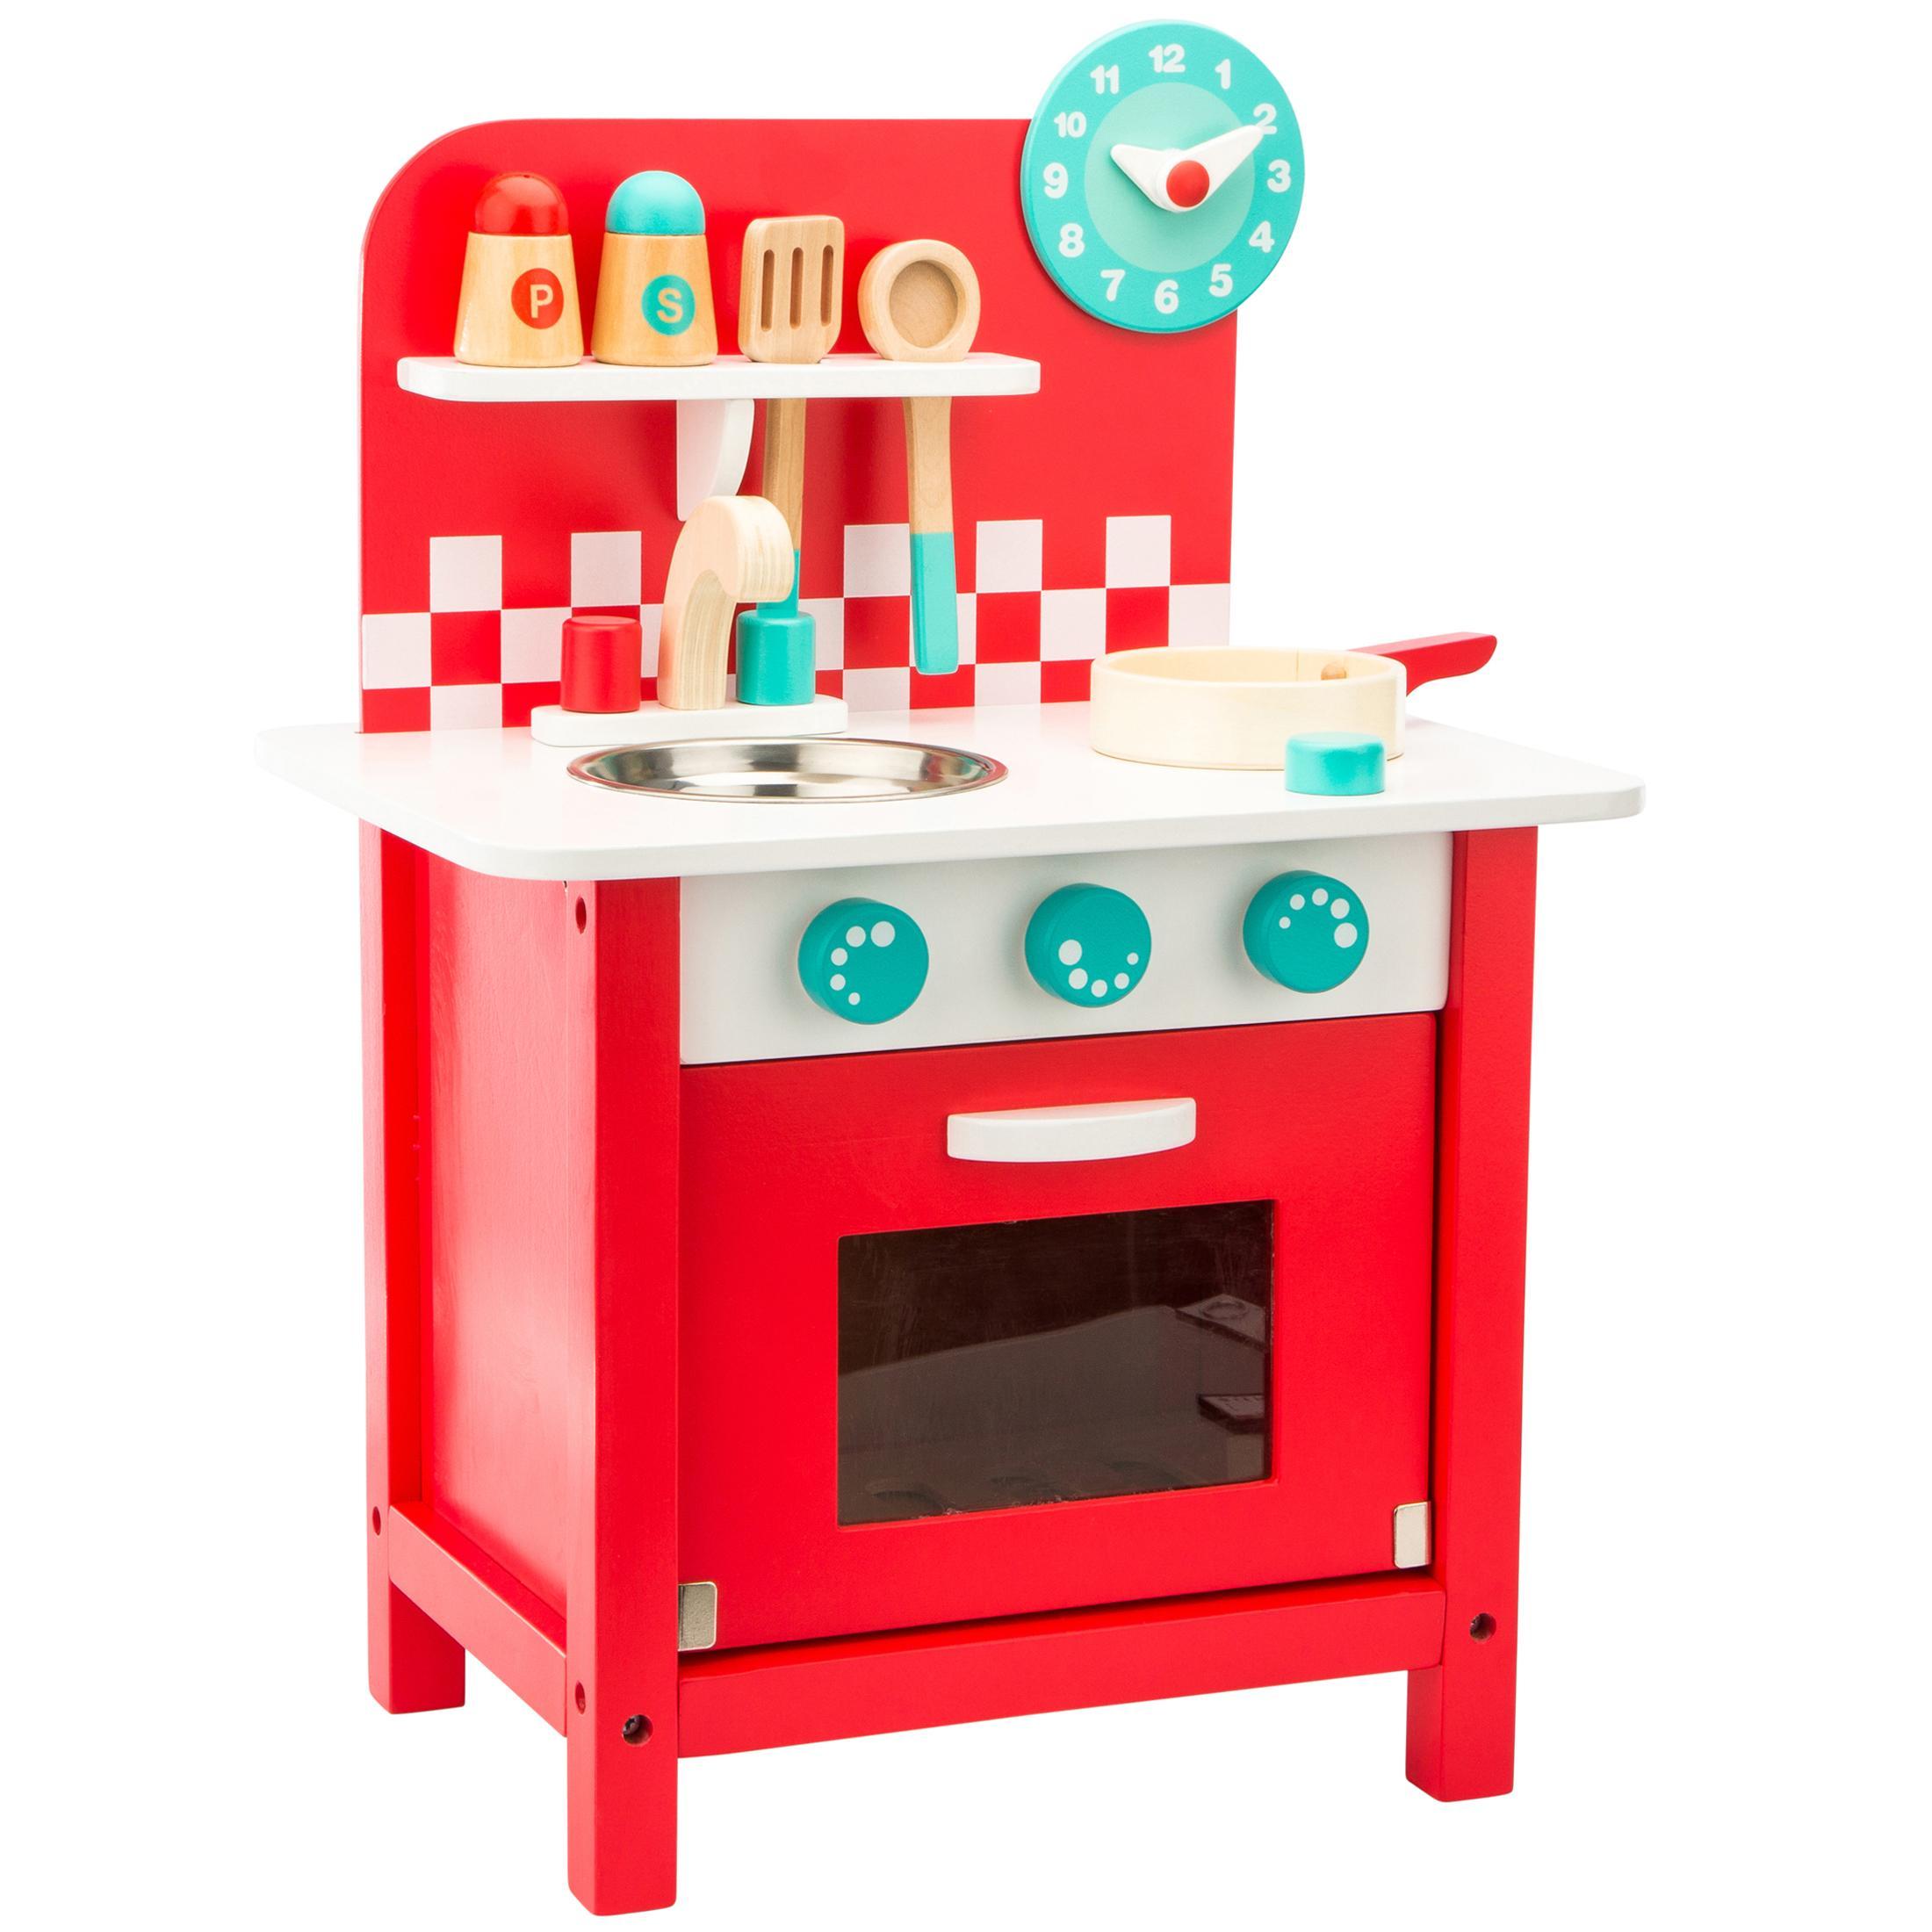 Ultrakidz cocinita de juguete charly 331900000082 - Como hacer cocinita de madera ...